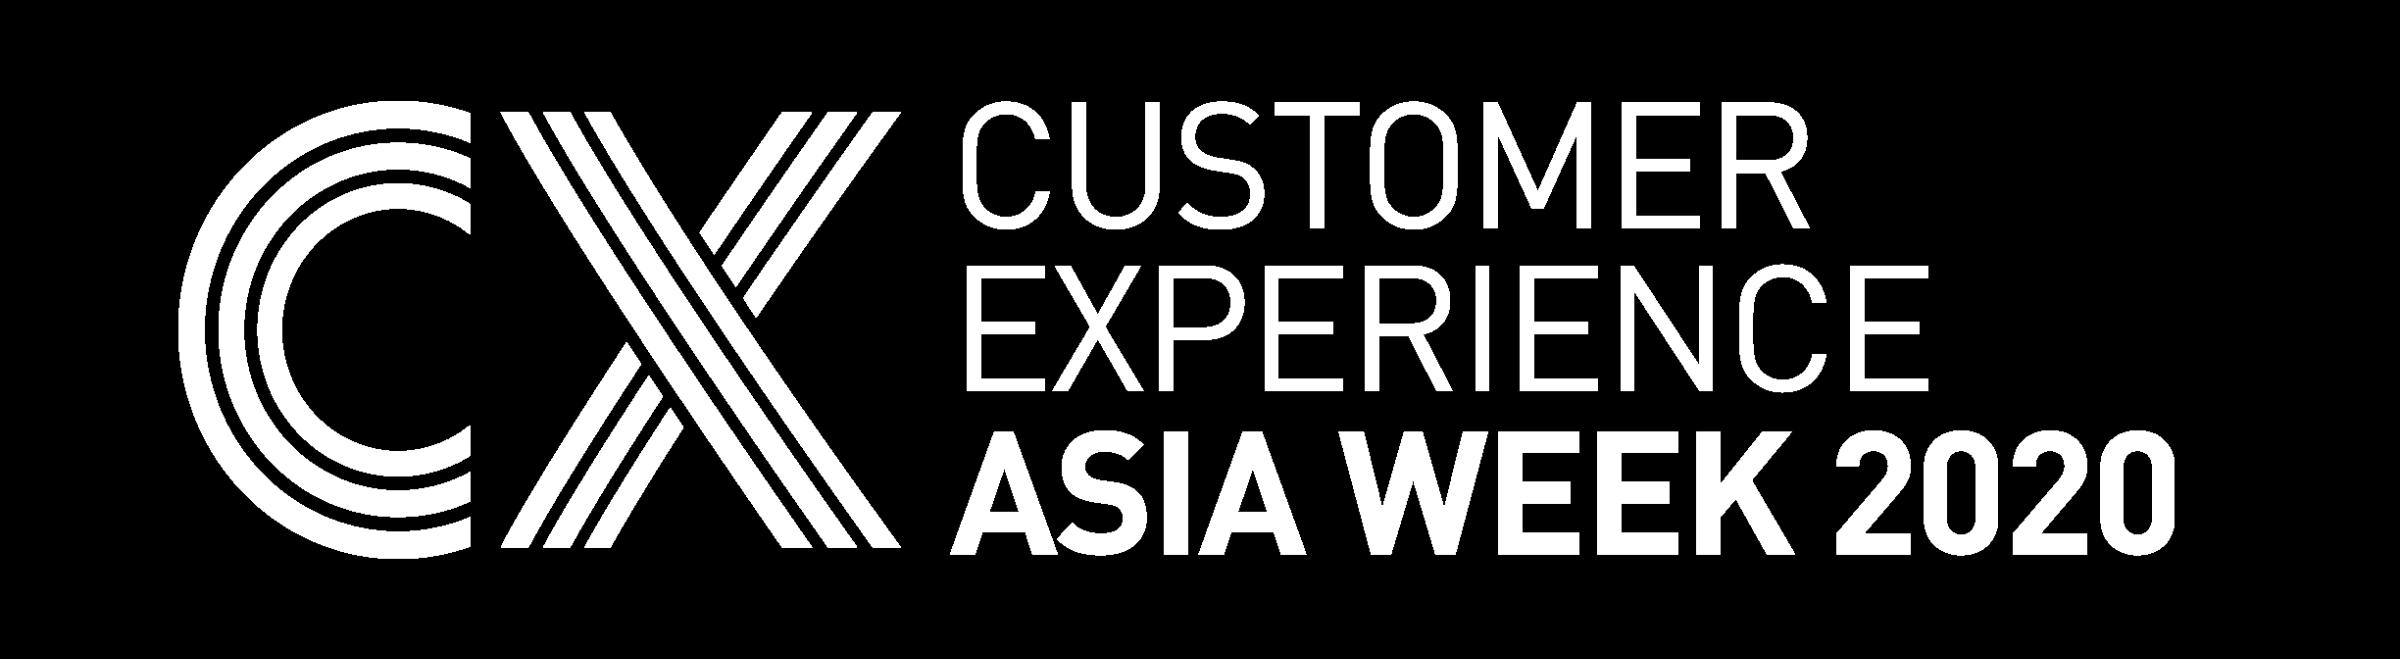 CX Asia Week 2020